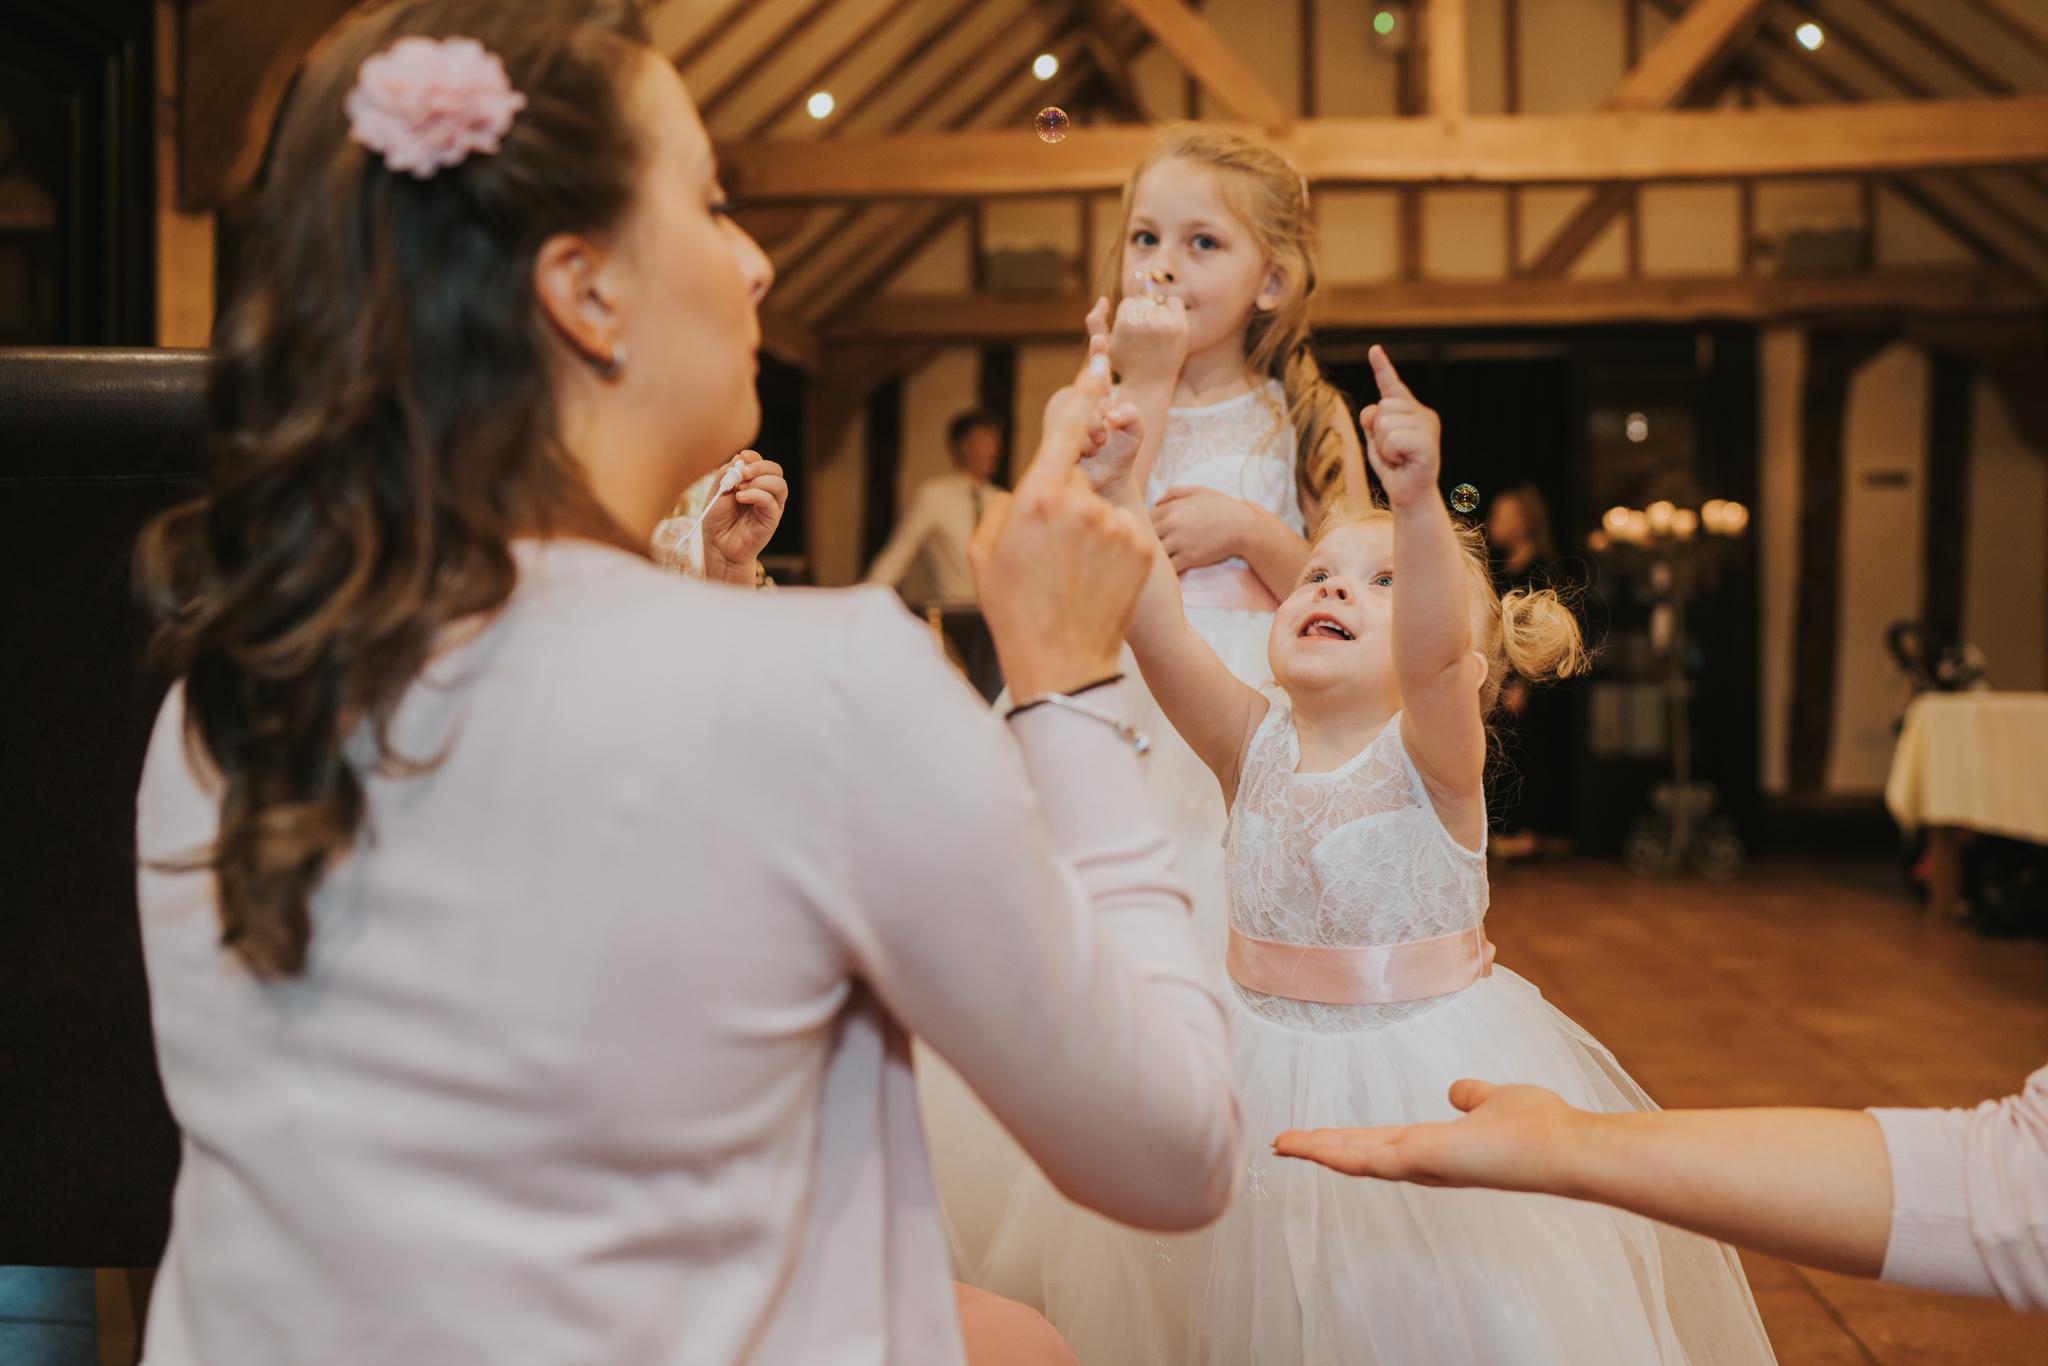 rhia-james-rustic-crabbs-barn-vintage-50s-retro-wedding-grace-elizabeth-colchester-essex-alternative-relaxed-wedding-family-photography-devon-suffolk-norfolk-essex (59 of 138).jpg